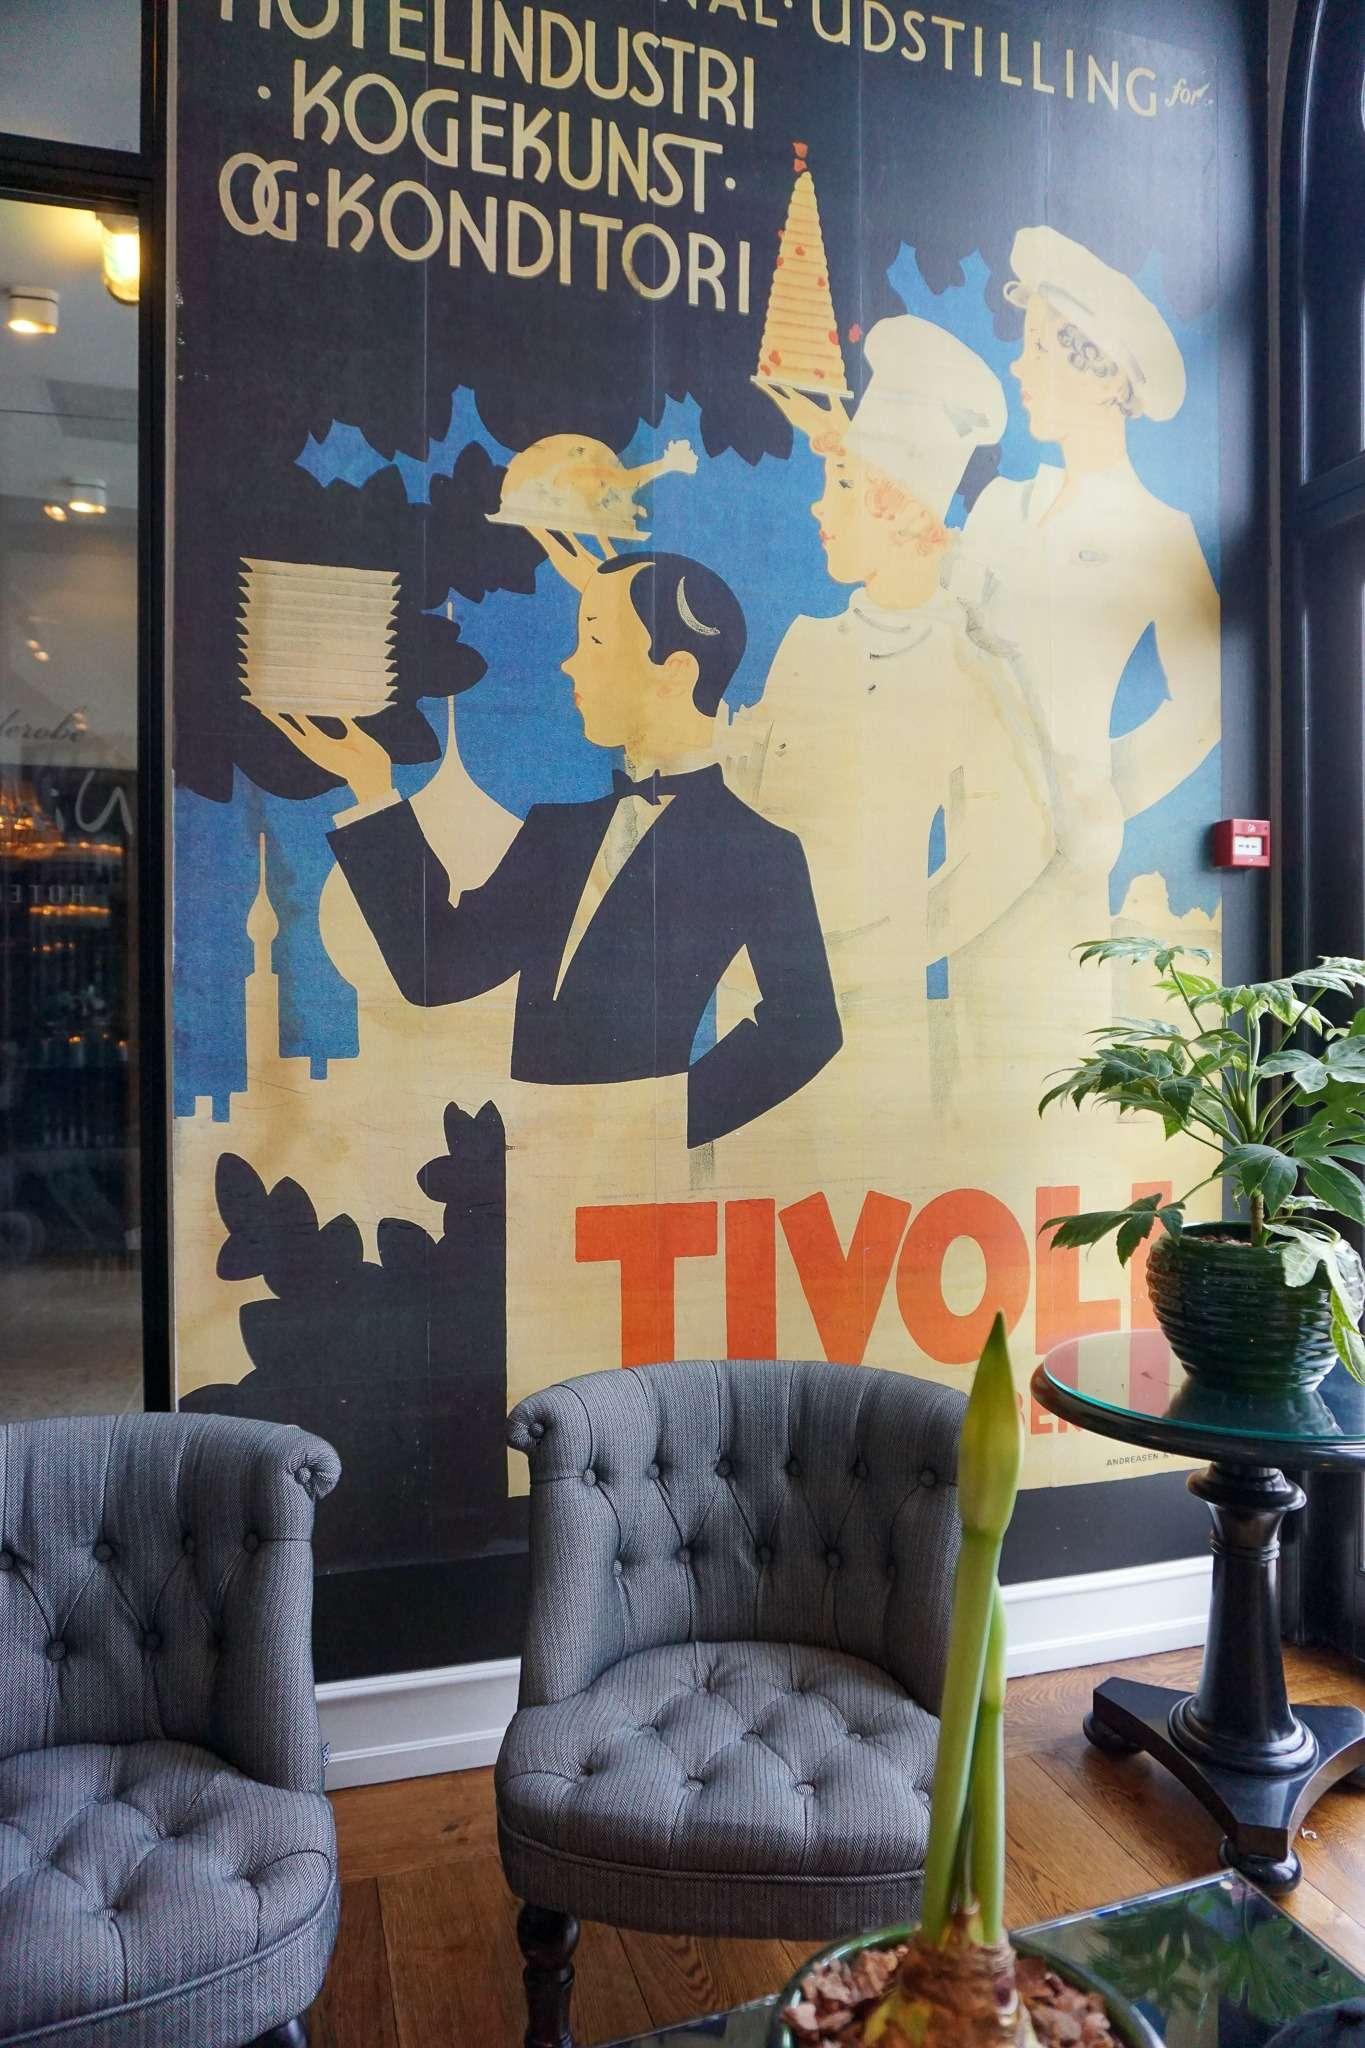 Tivoli Gardens themed artwork on the wall of the restaurant in the Nimb Hotel Copenhagen